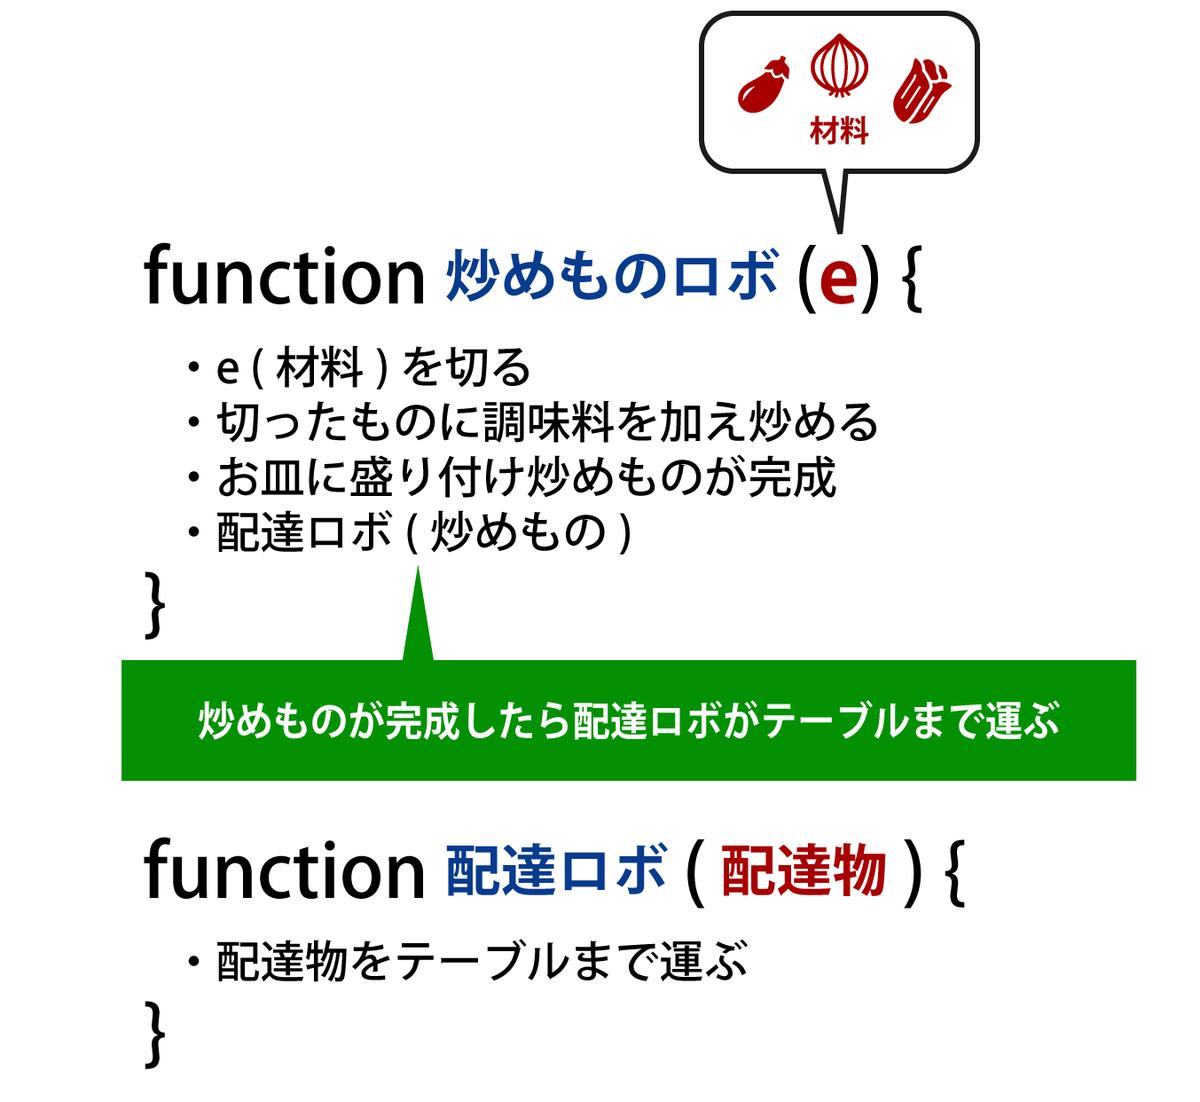 f:id:yukibnb:20200505234009p:plain